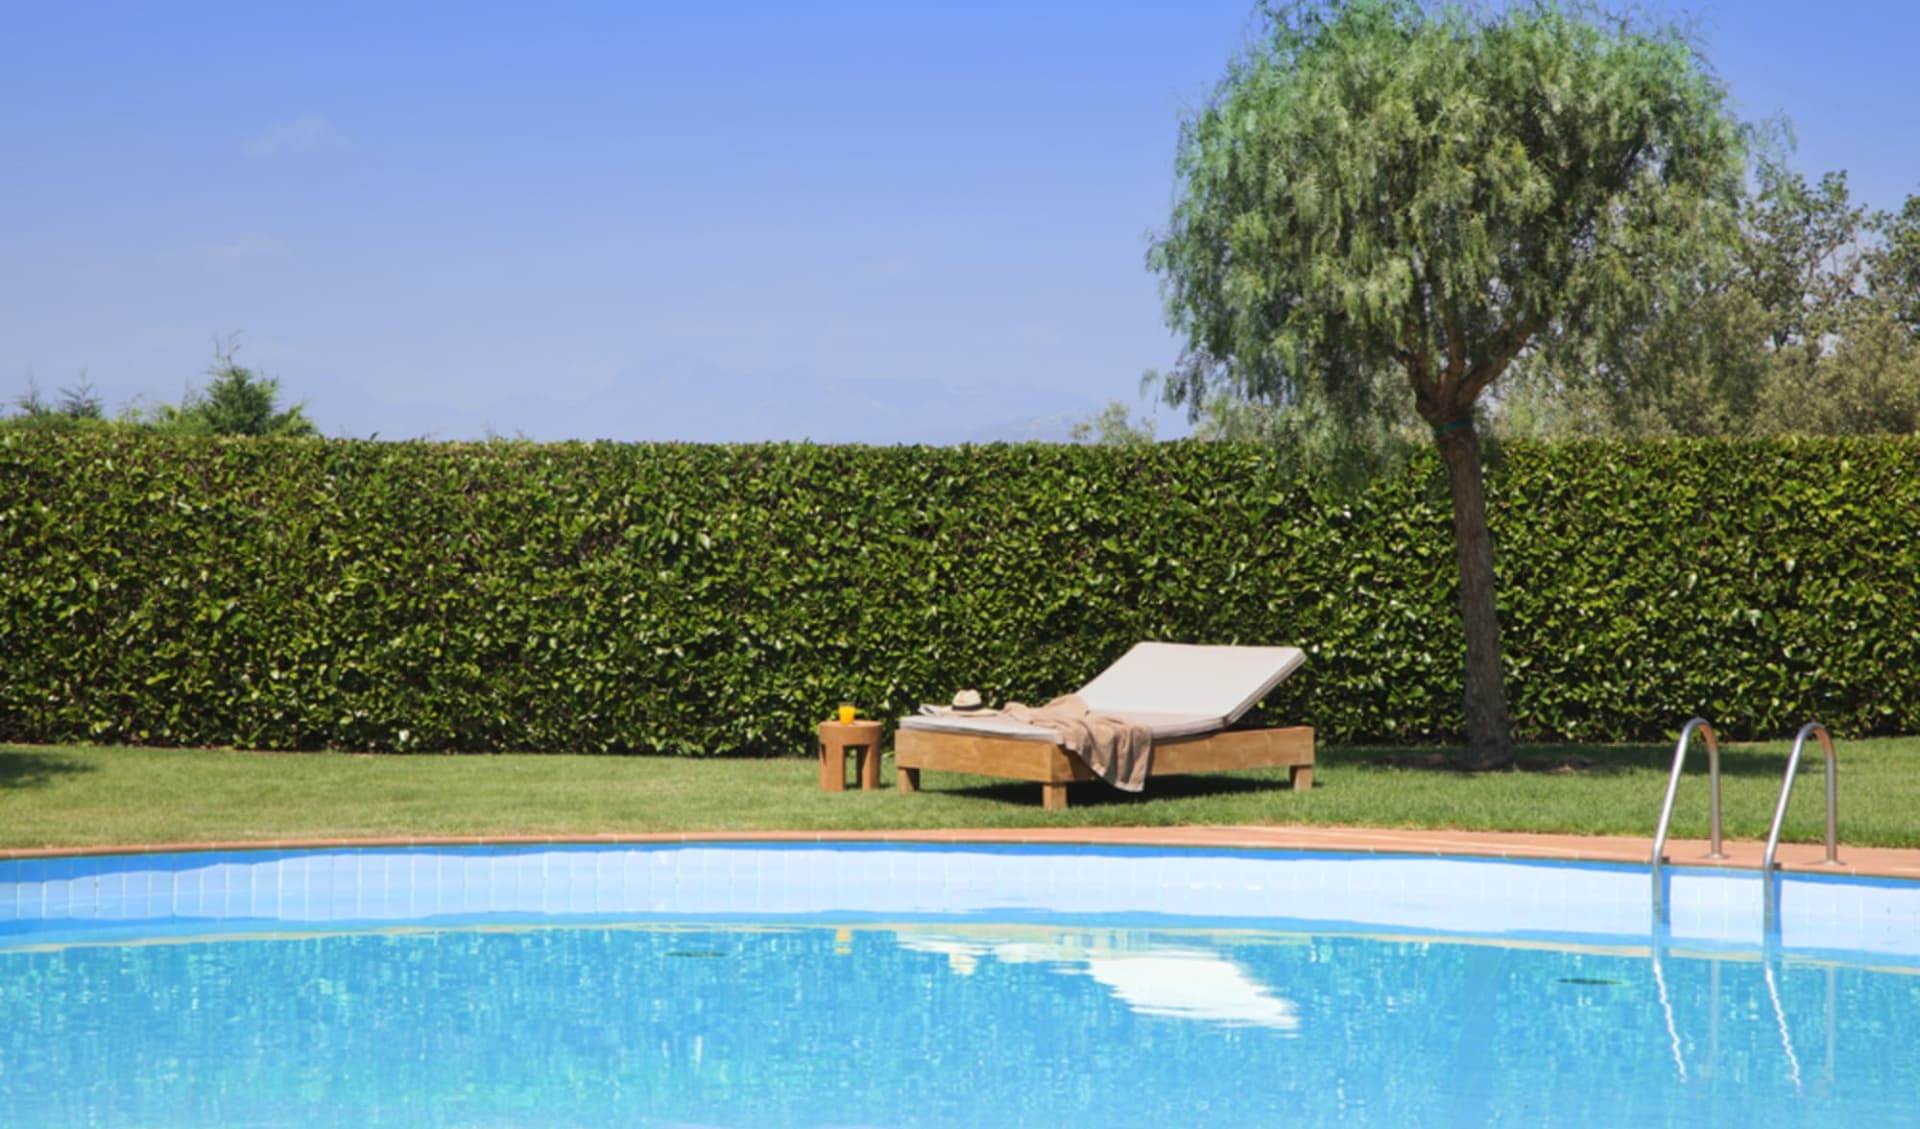 16.10. - 23.10.2021 Golf Trainingswoche an der Costa Brava ab Barcelona: Peralada Pool